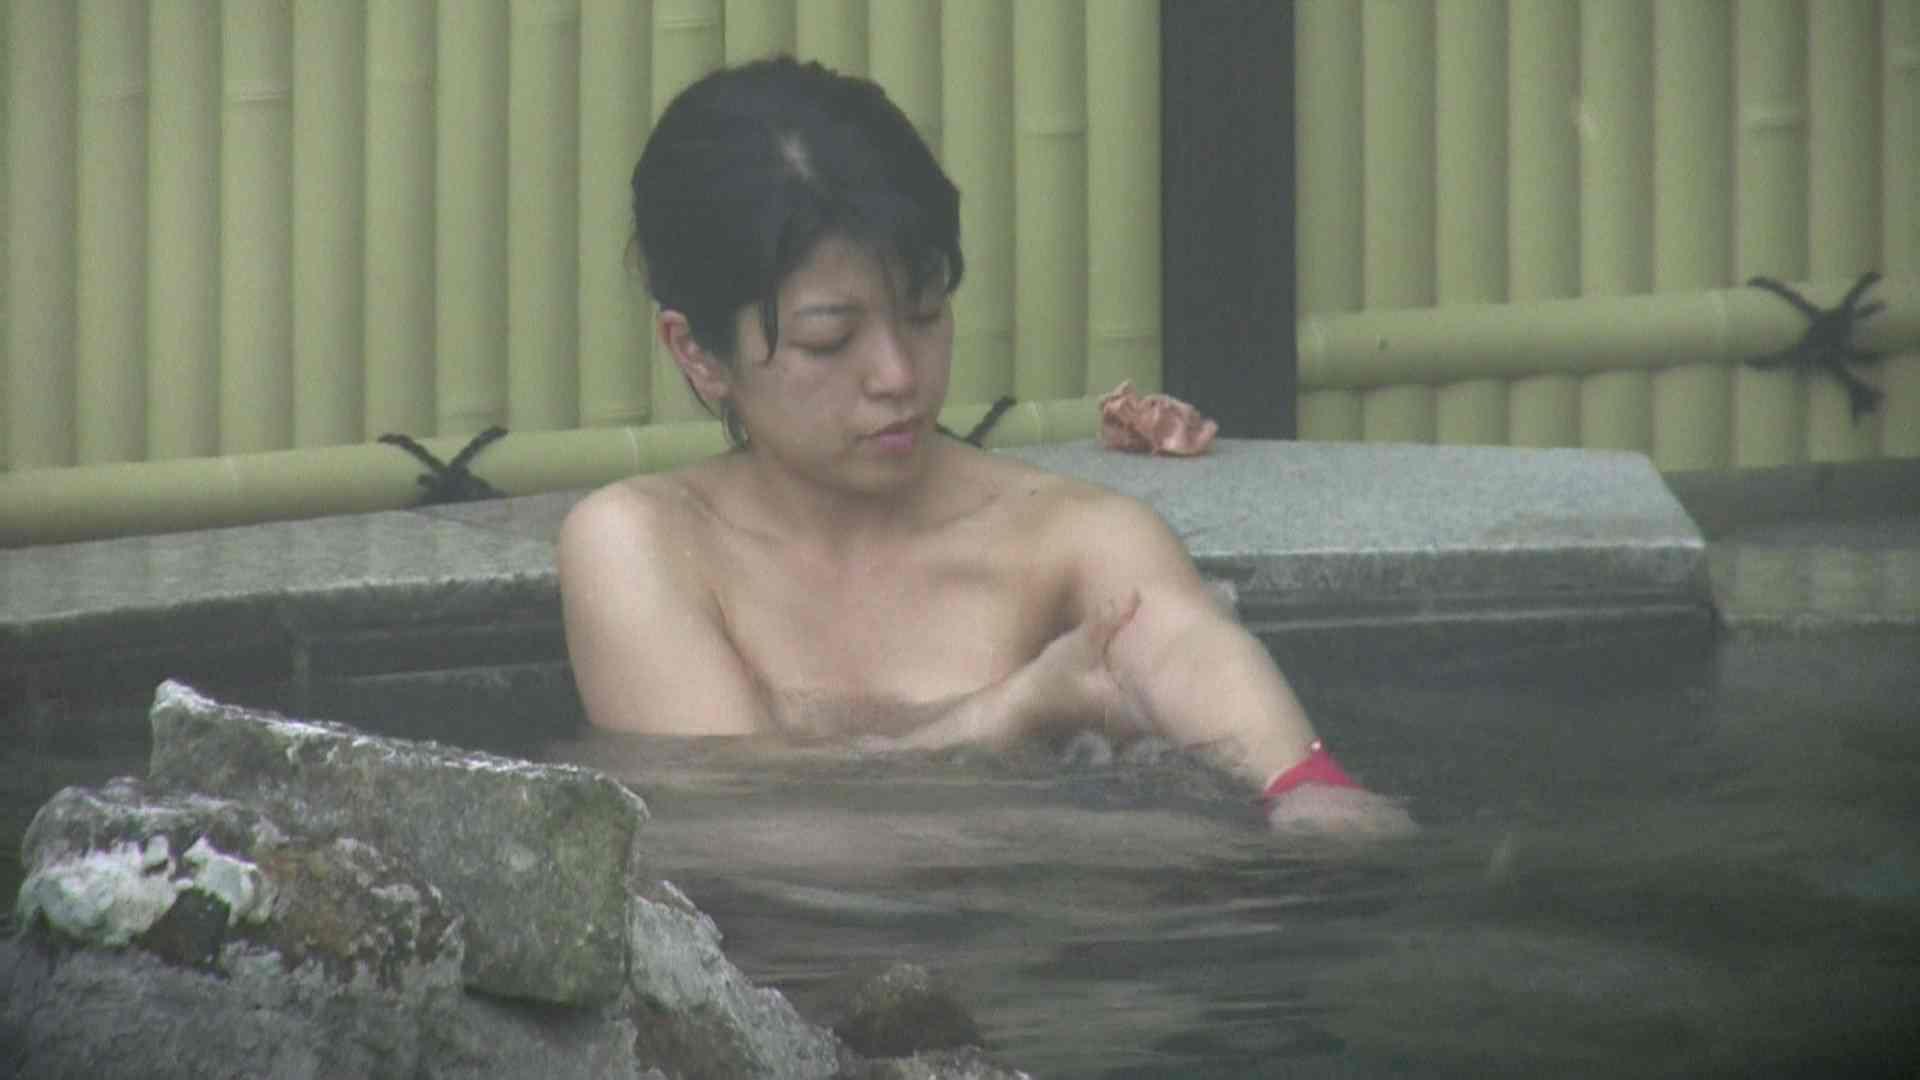 Aquaな露天風呂Vol.585 HなOL | 盗撮  93pic 82